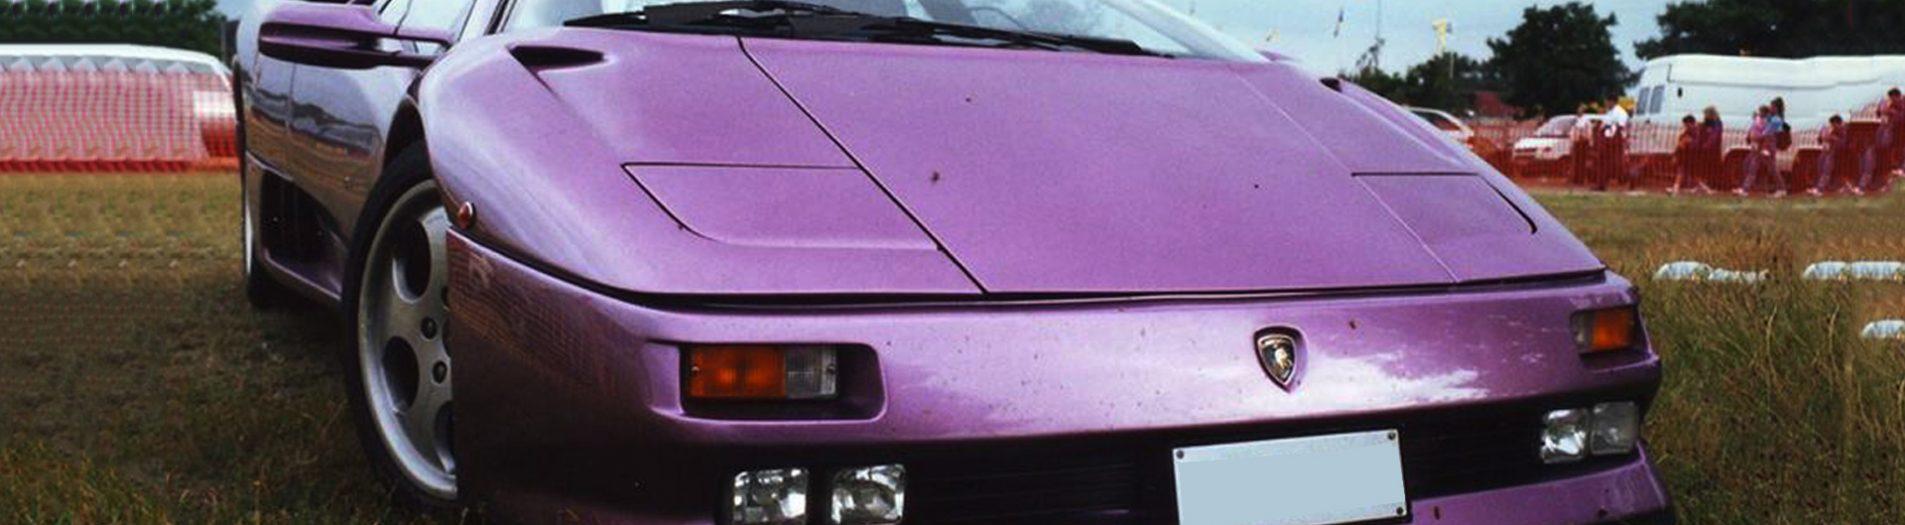 Next project: Lamborghini - Diablo SE30 / 1994